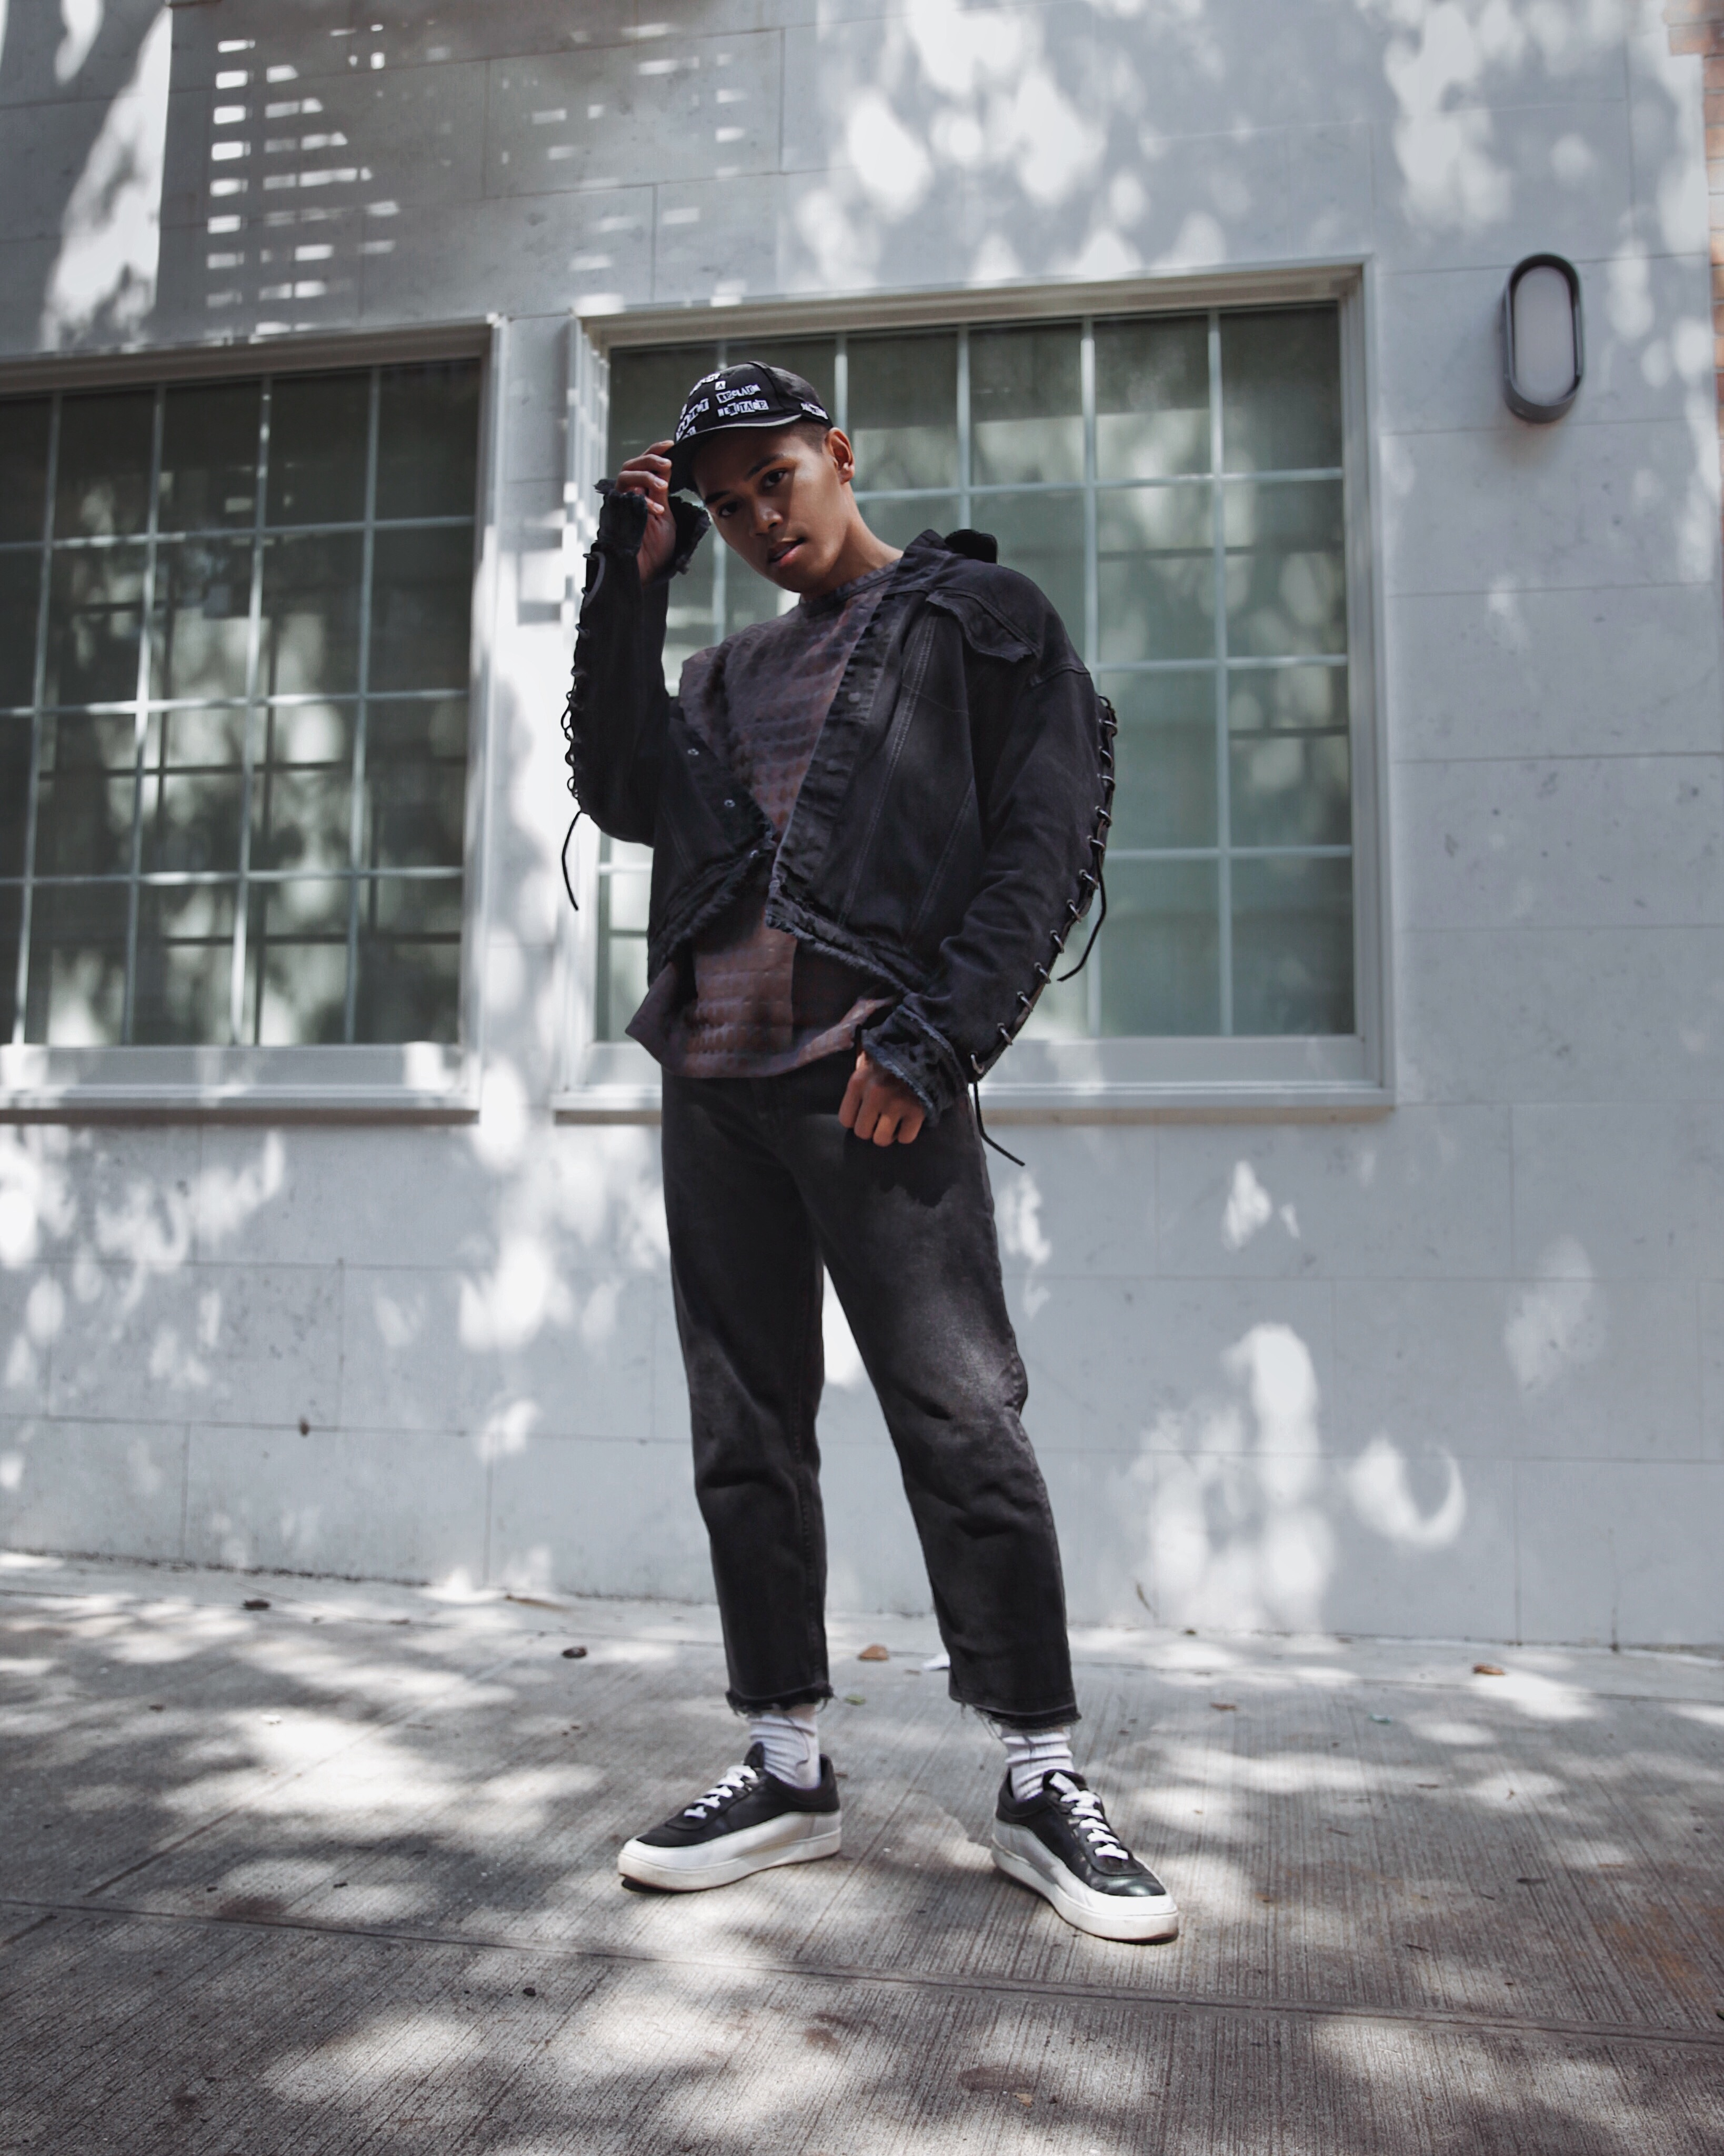 hm trend denim jacket with metal rings streetwear street style blogger